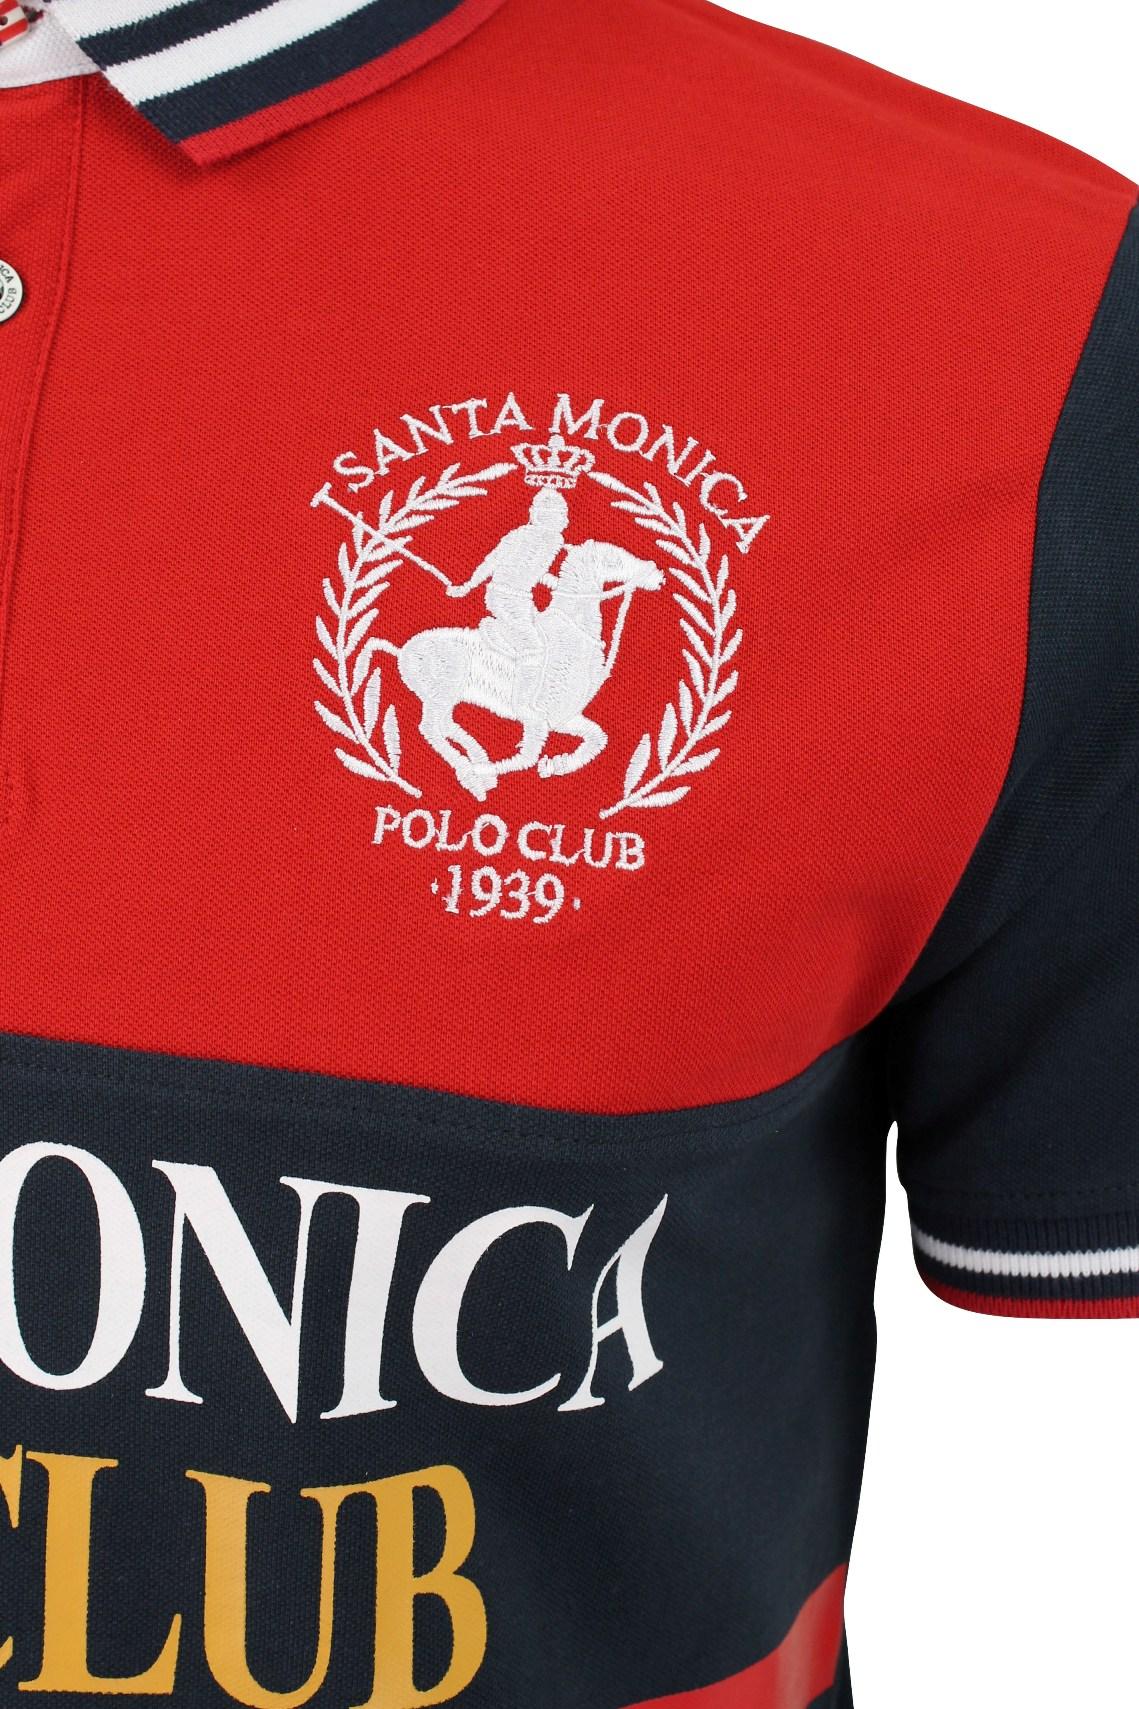 Mens Polo Shirt by Santa Monica Short Sleeved